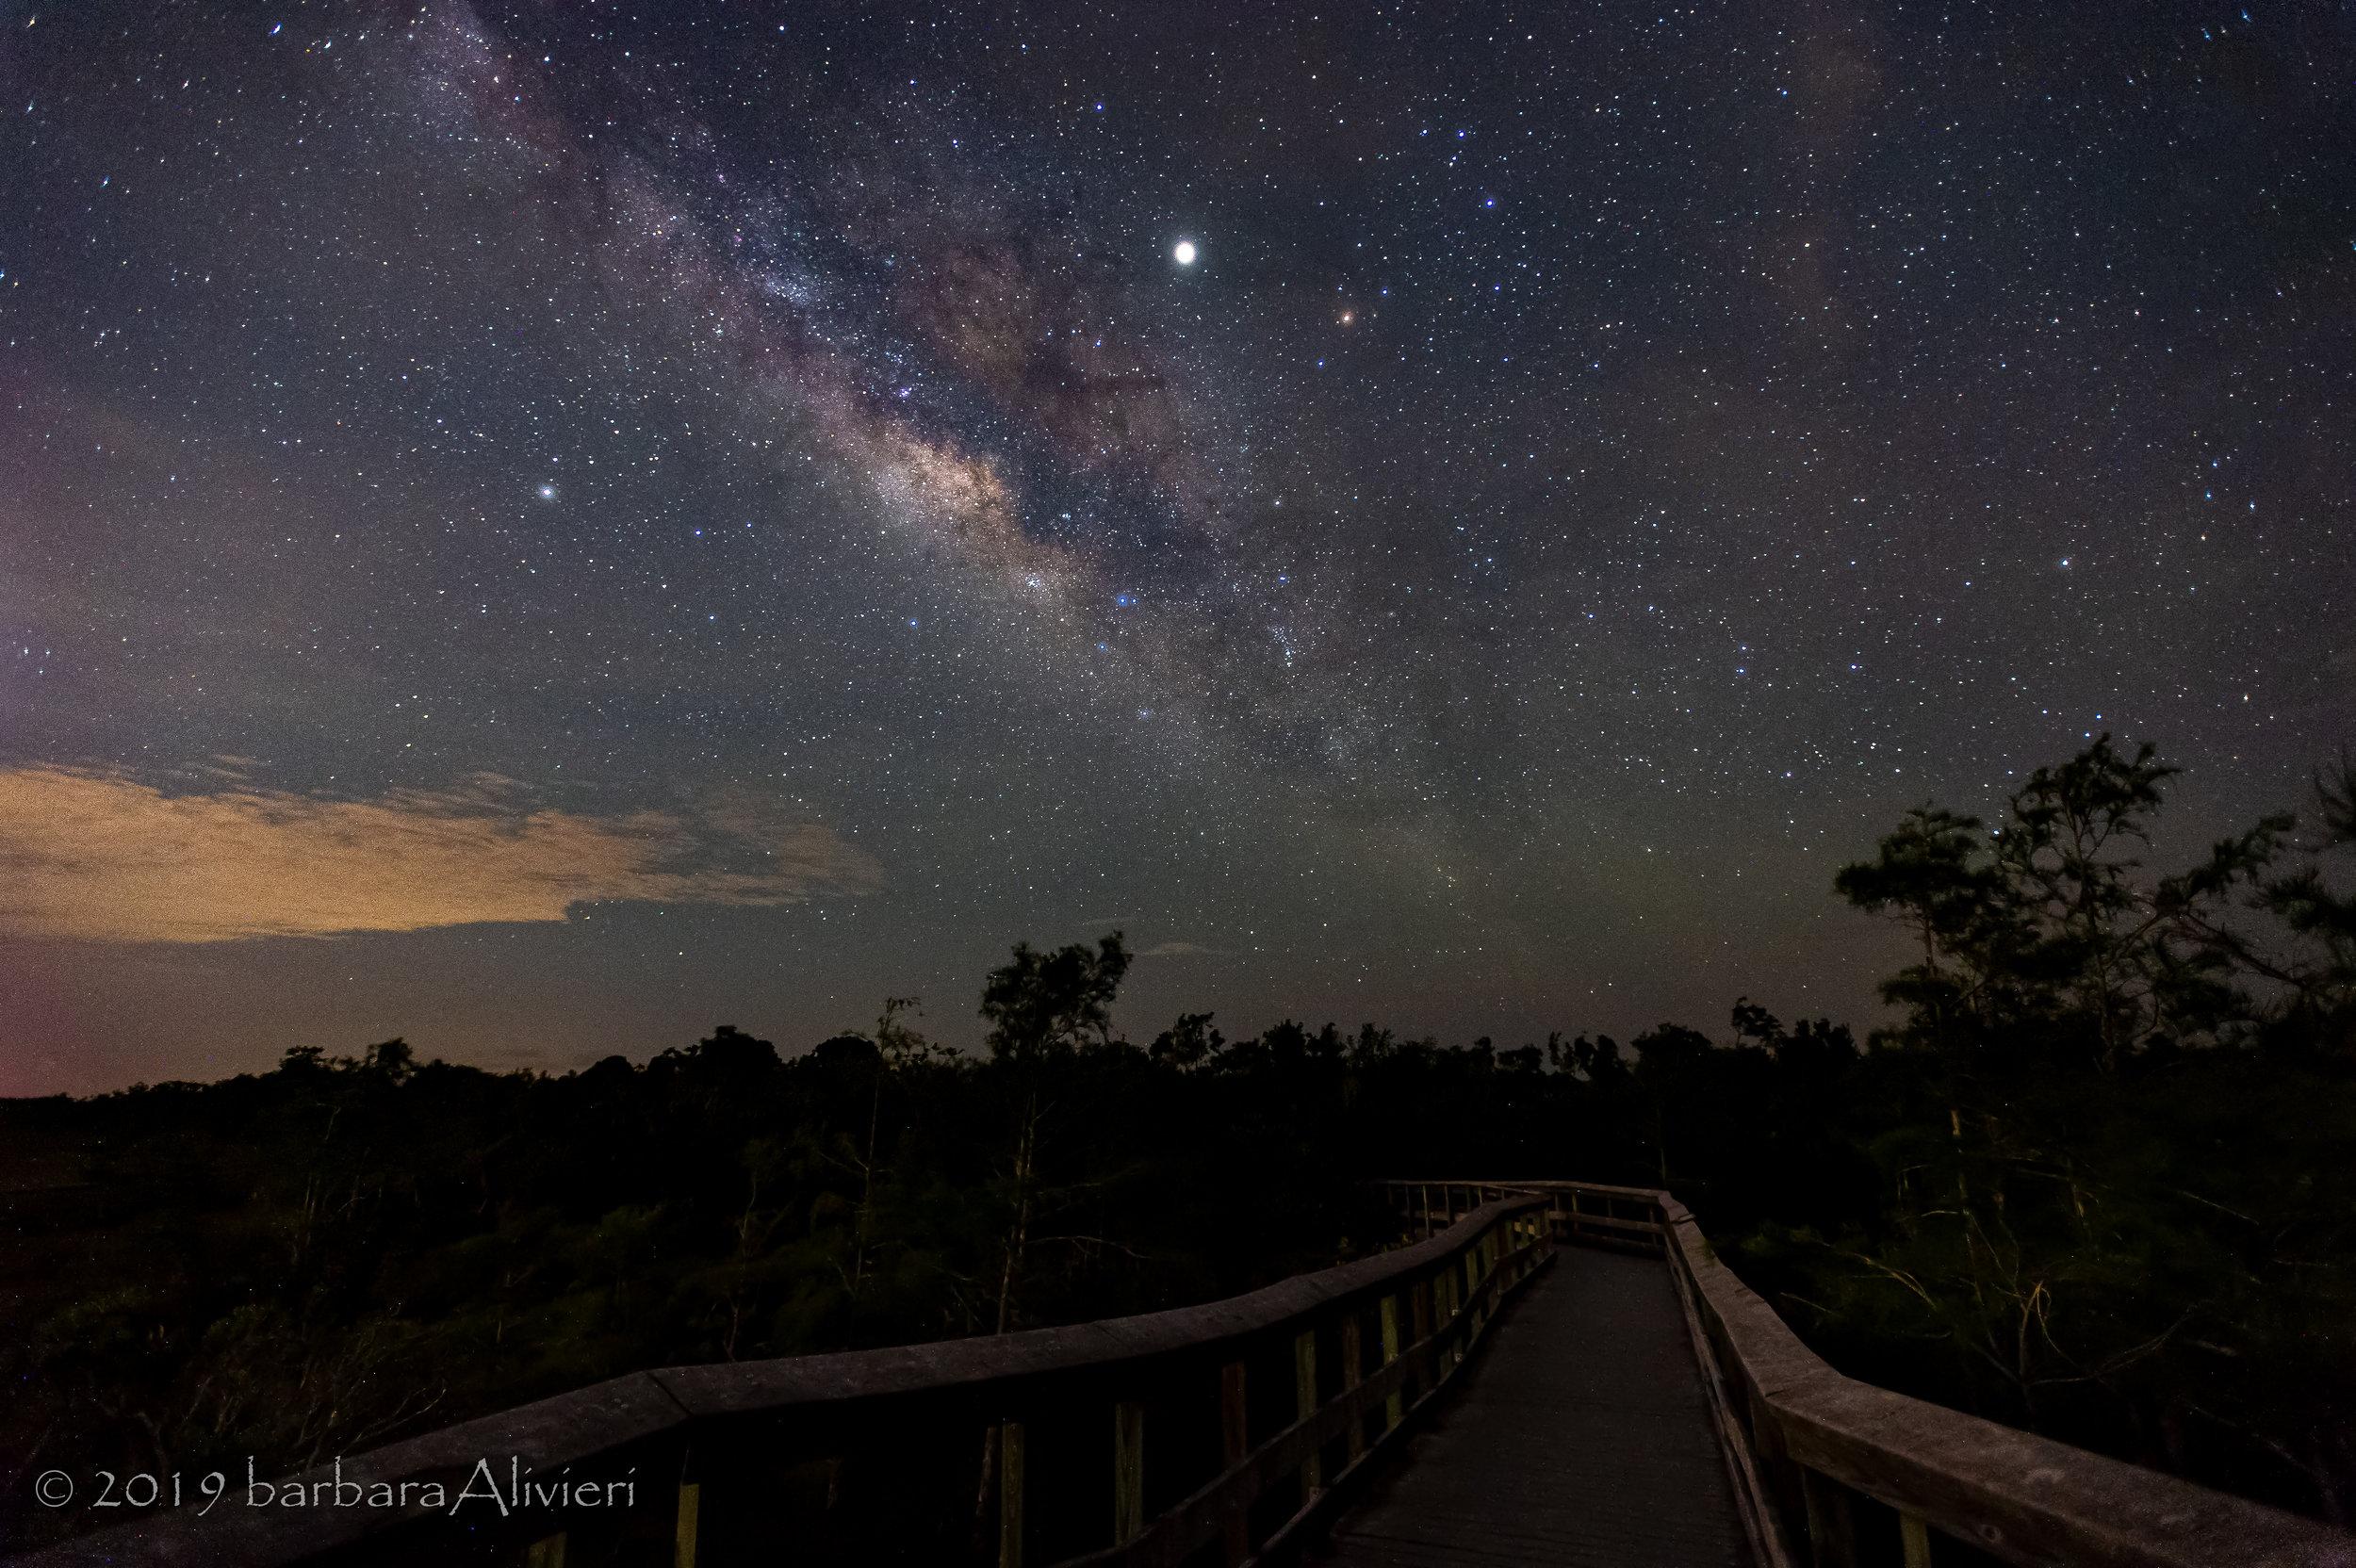 Milky way over the boardwalk.